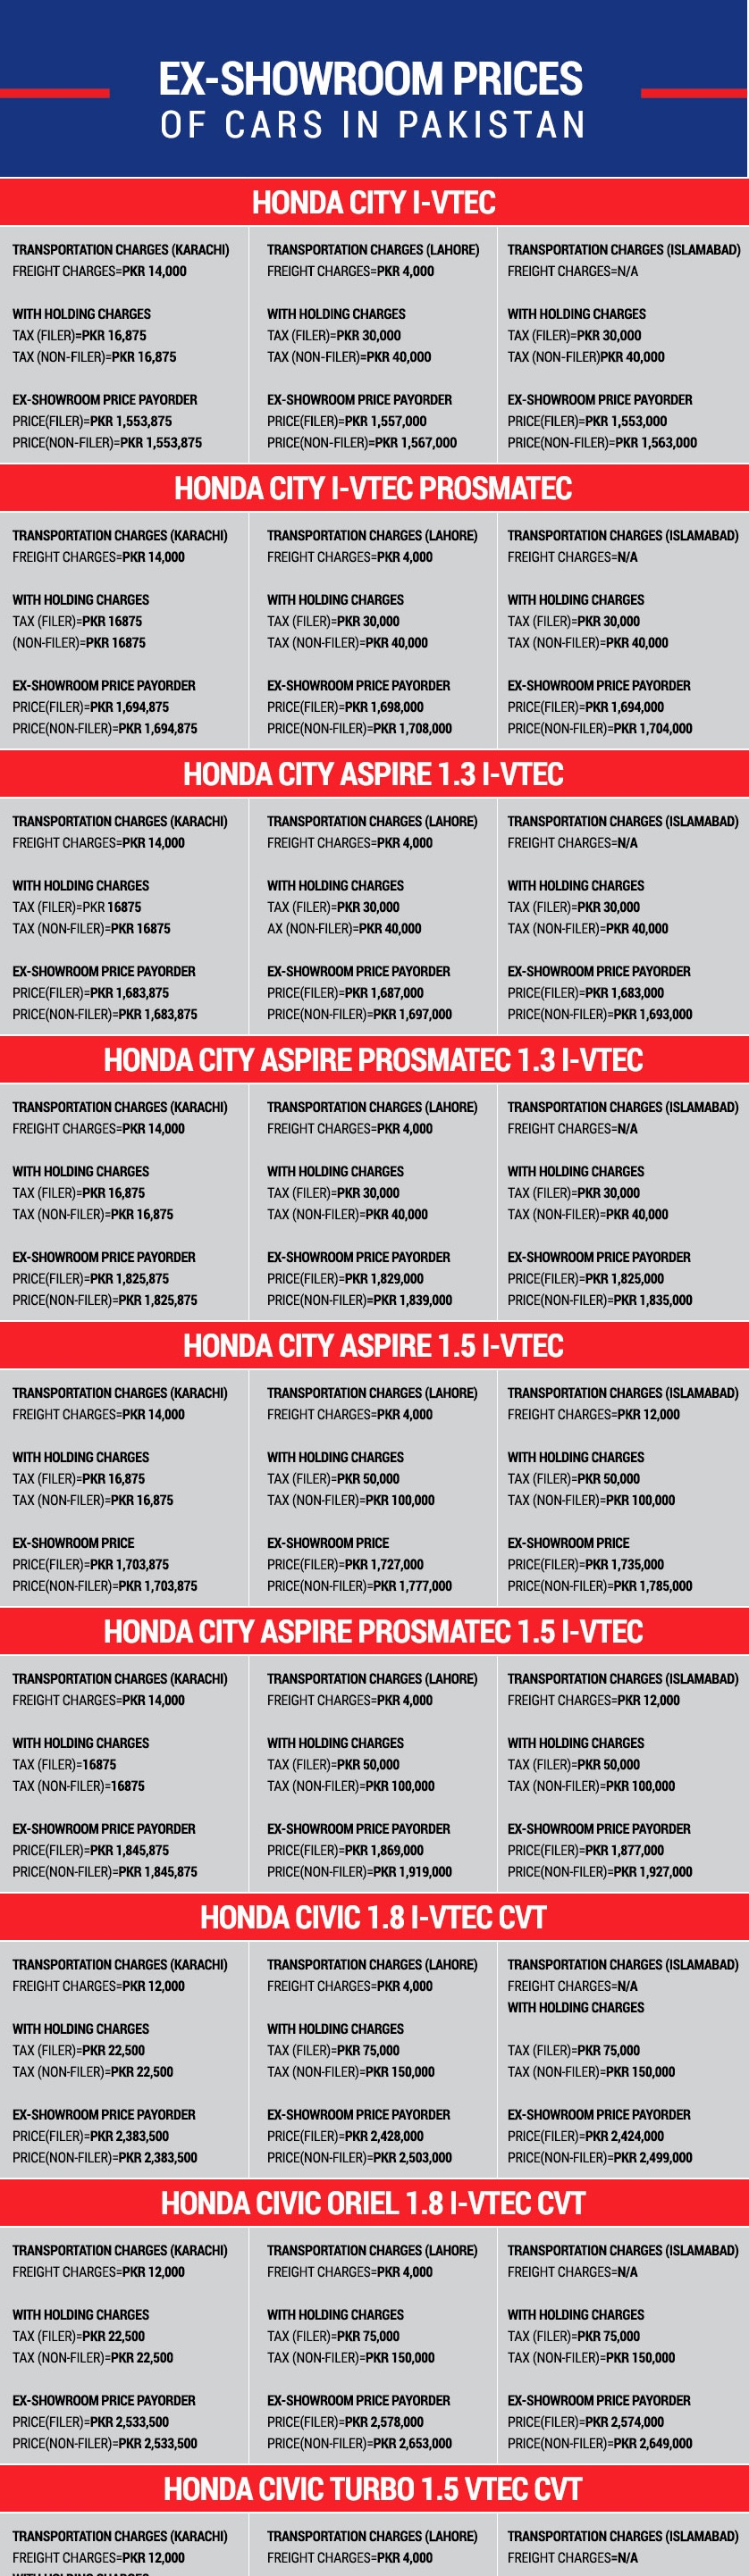 Honda price